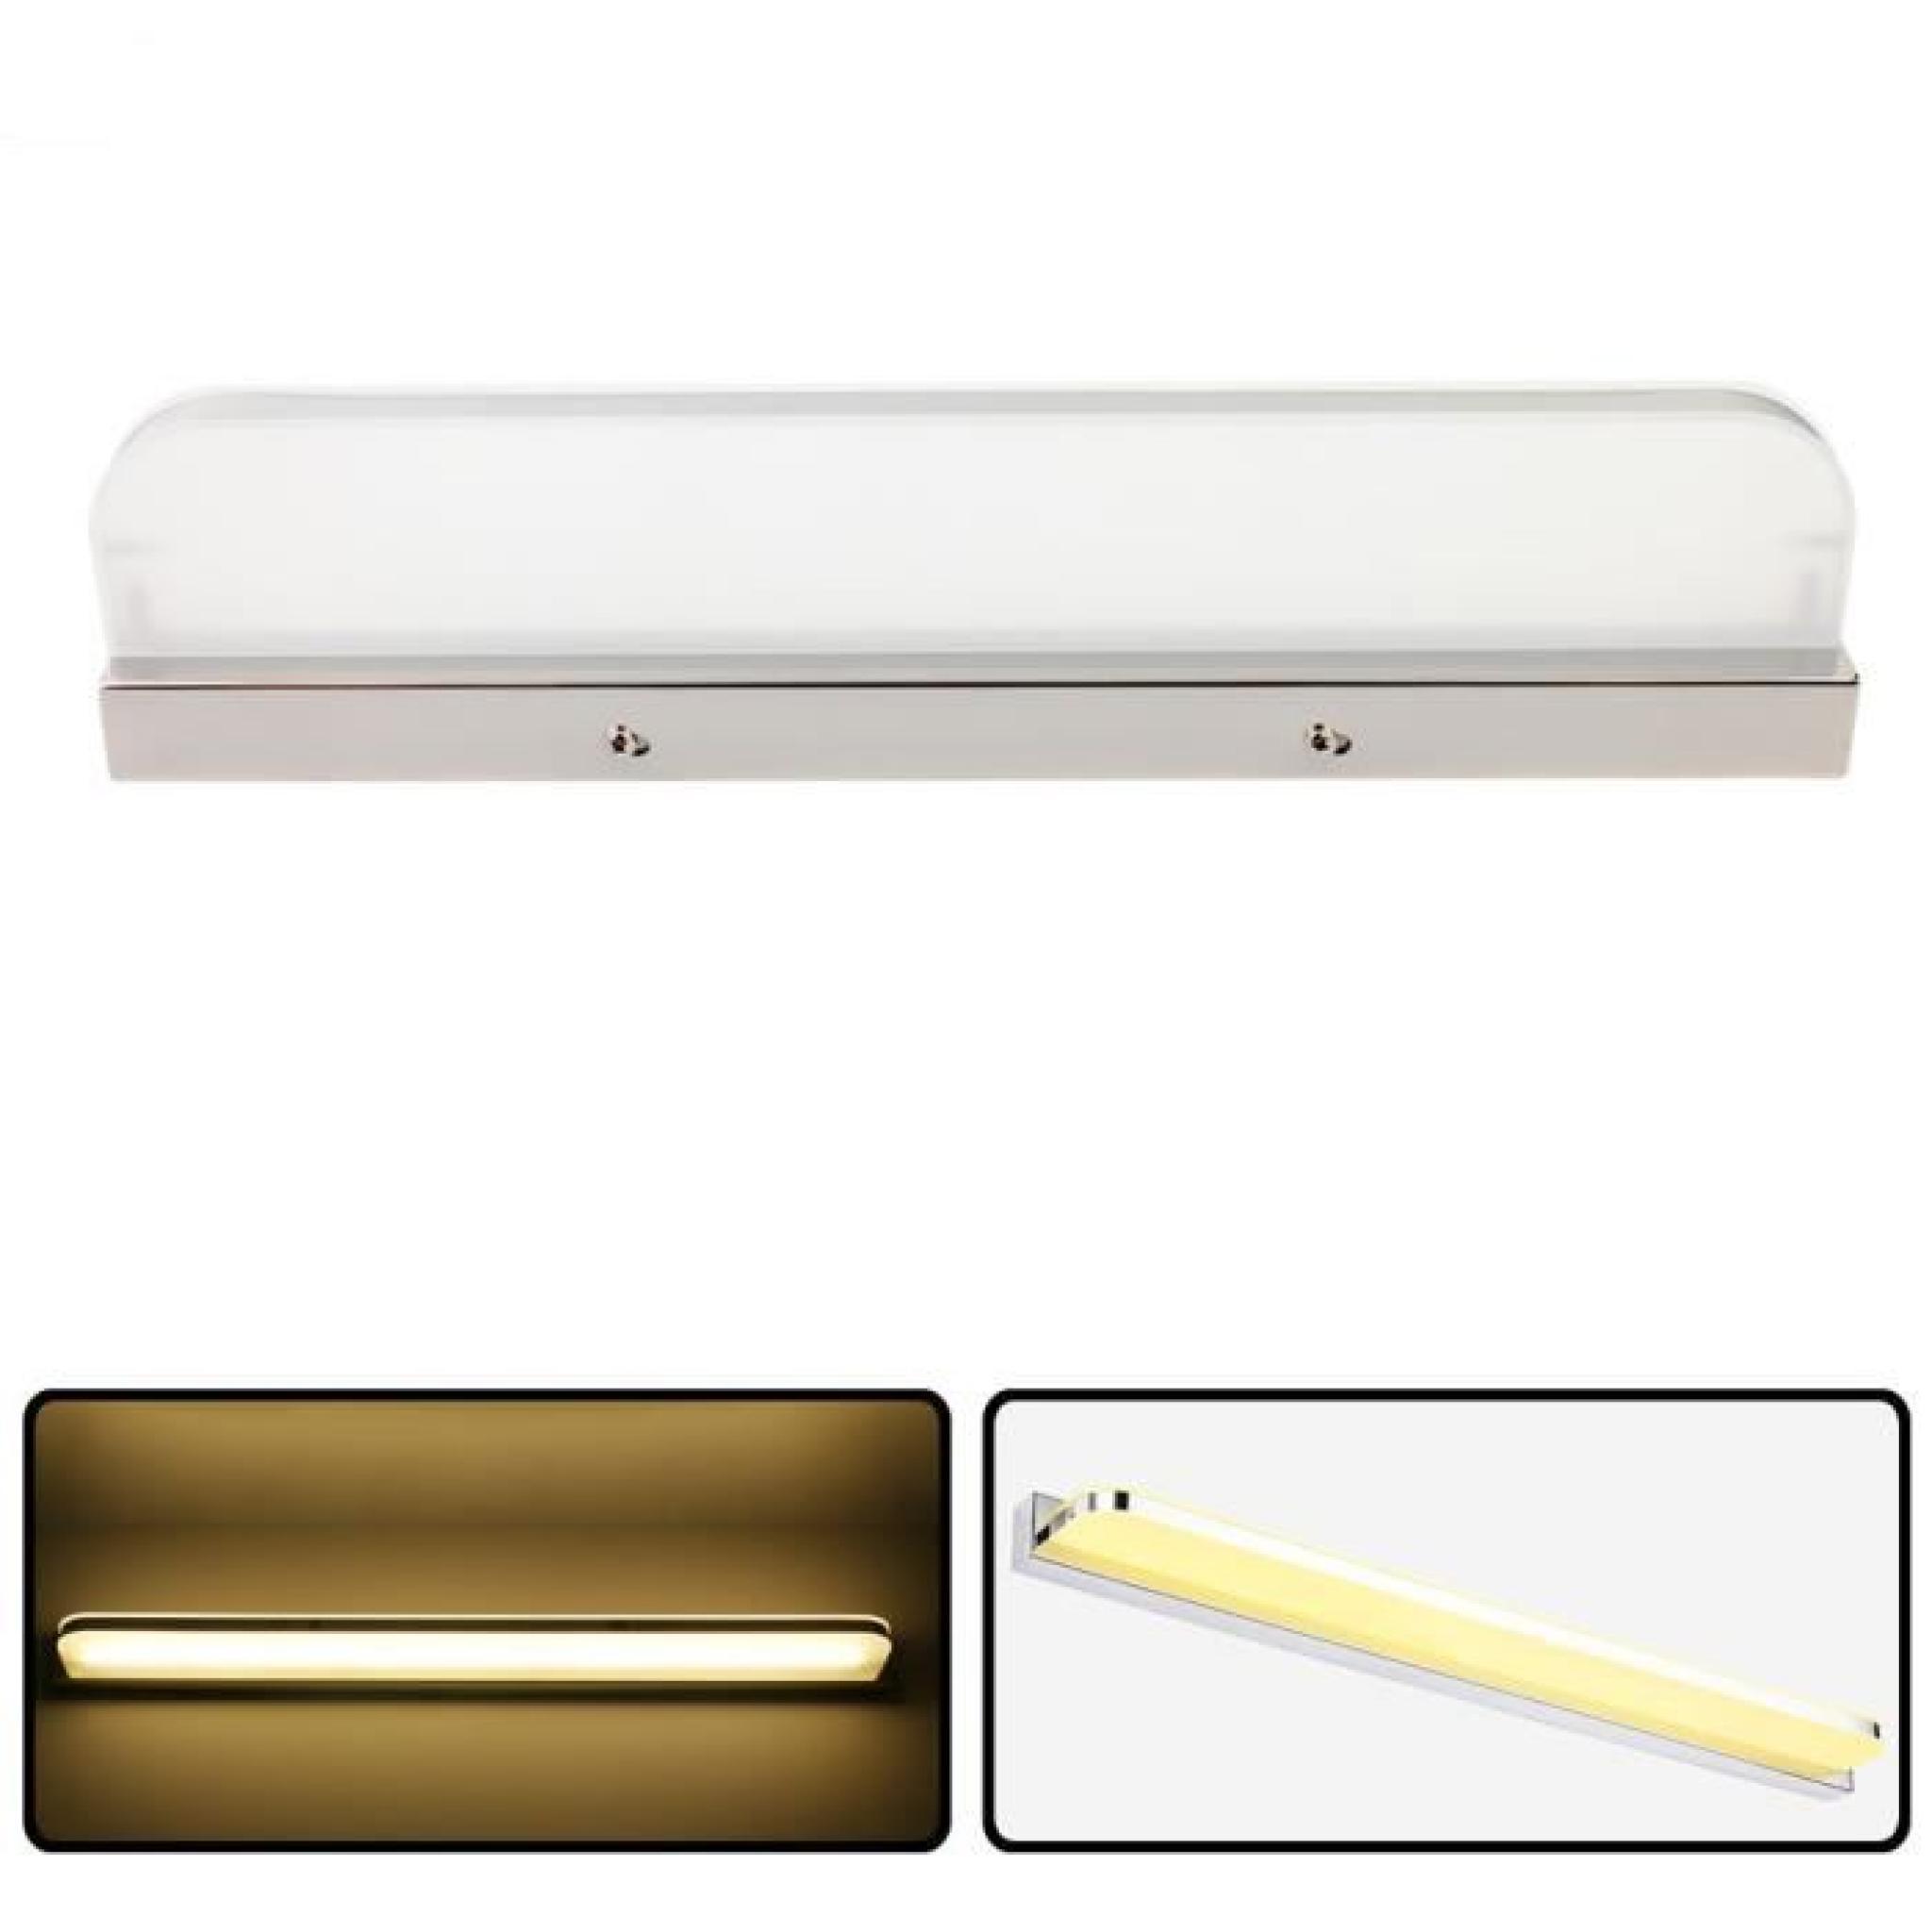 7w Miroir Etanche Lampe Maquillage Led Moderne Led Ac 90 265v 770lm